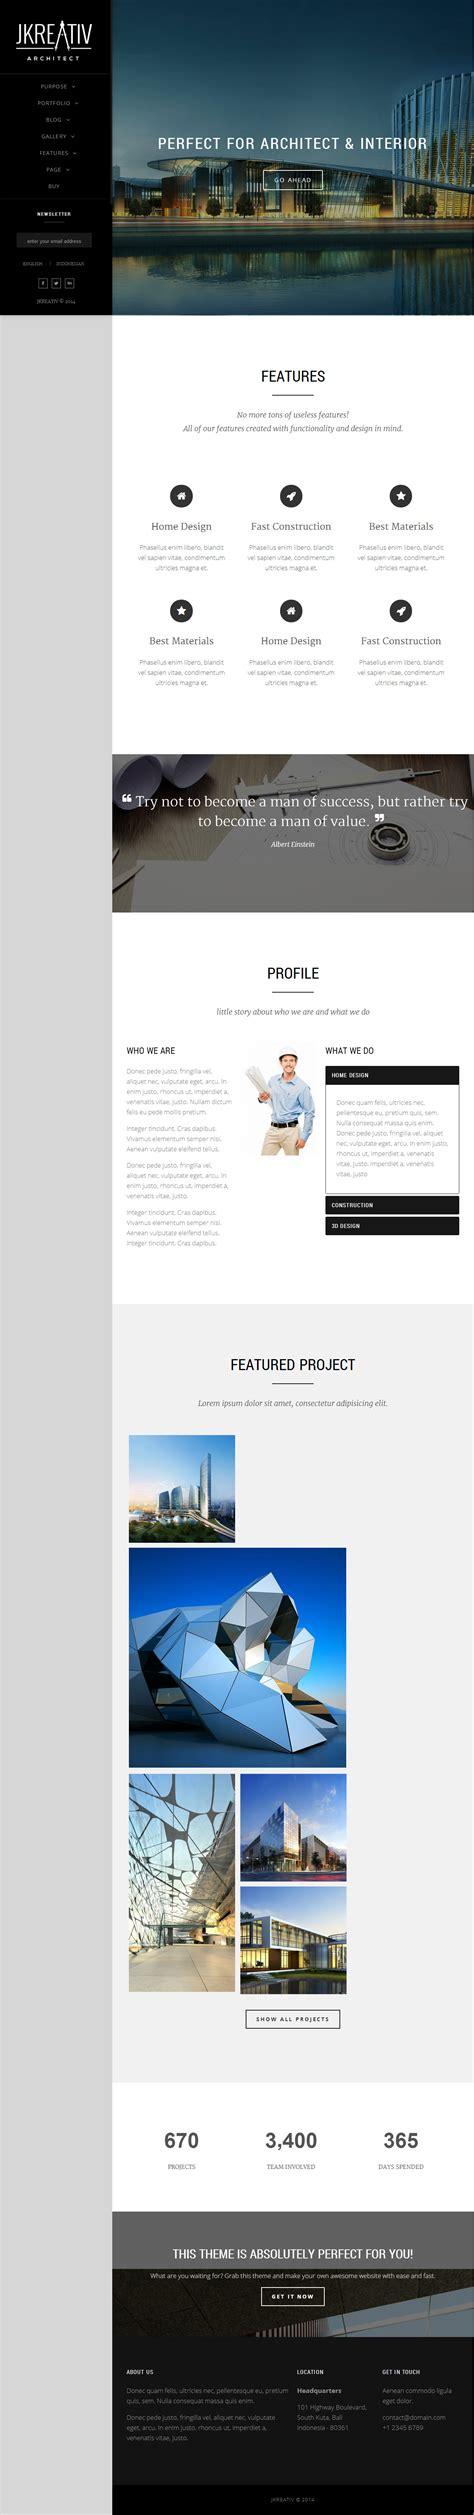 best home design websites 2014 100 best home design websites 2014 50 best websites